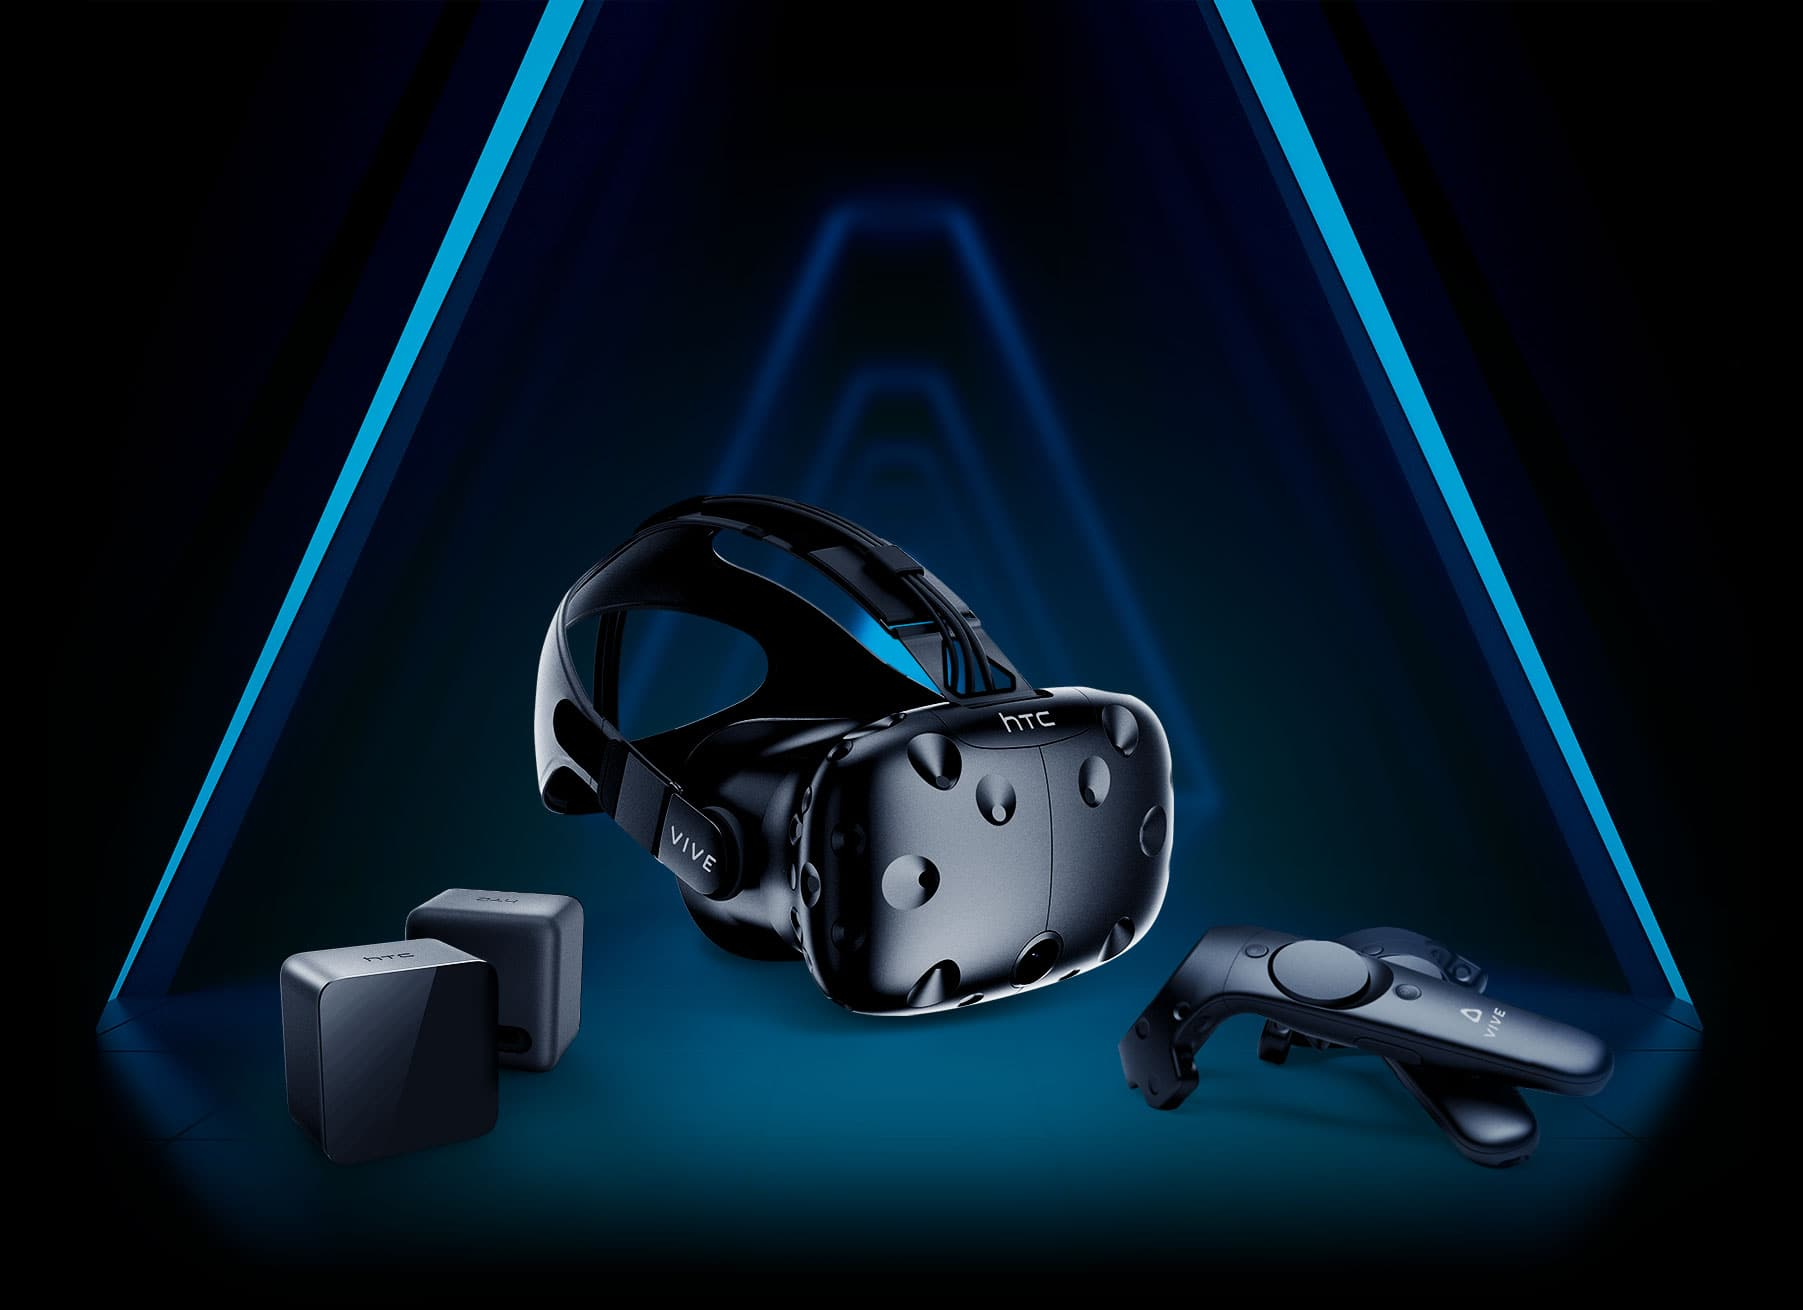 HTC Vive $499 at Vive.com